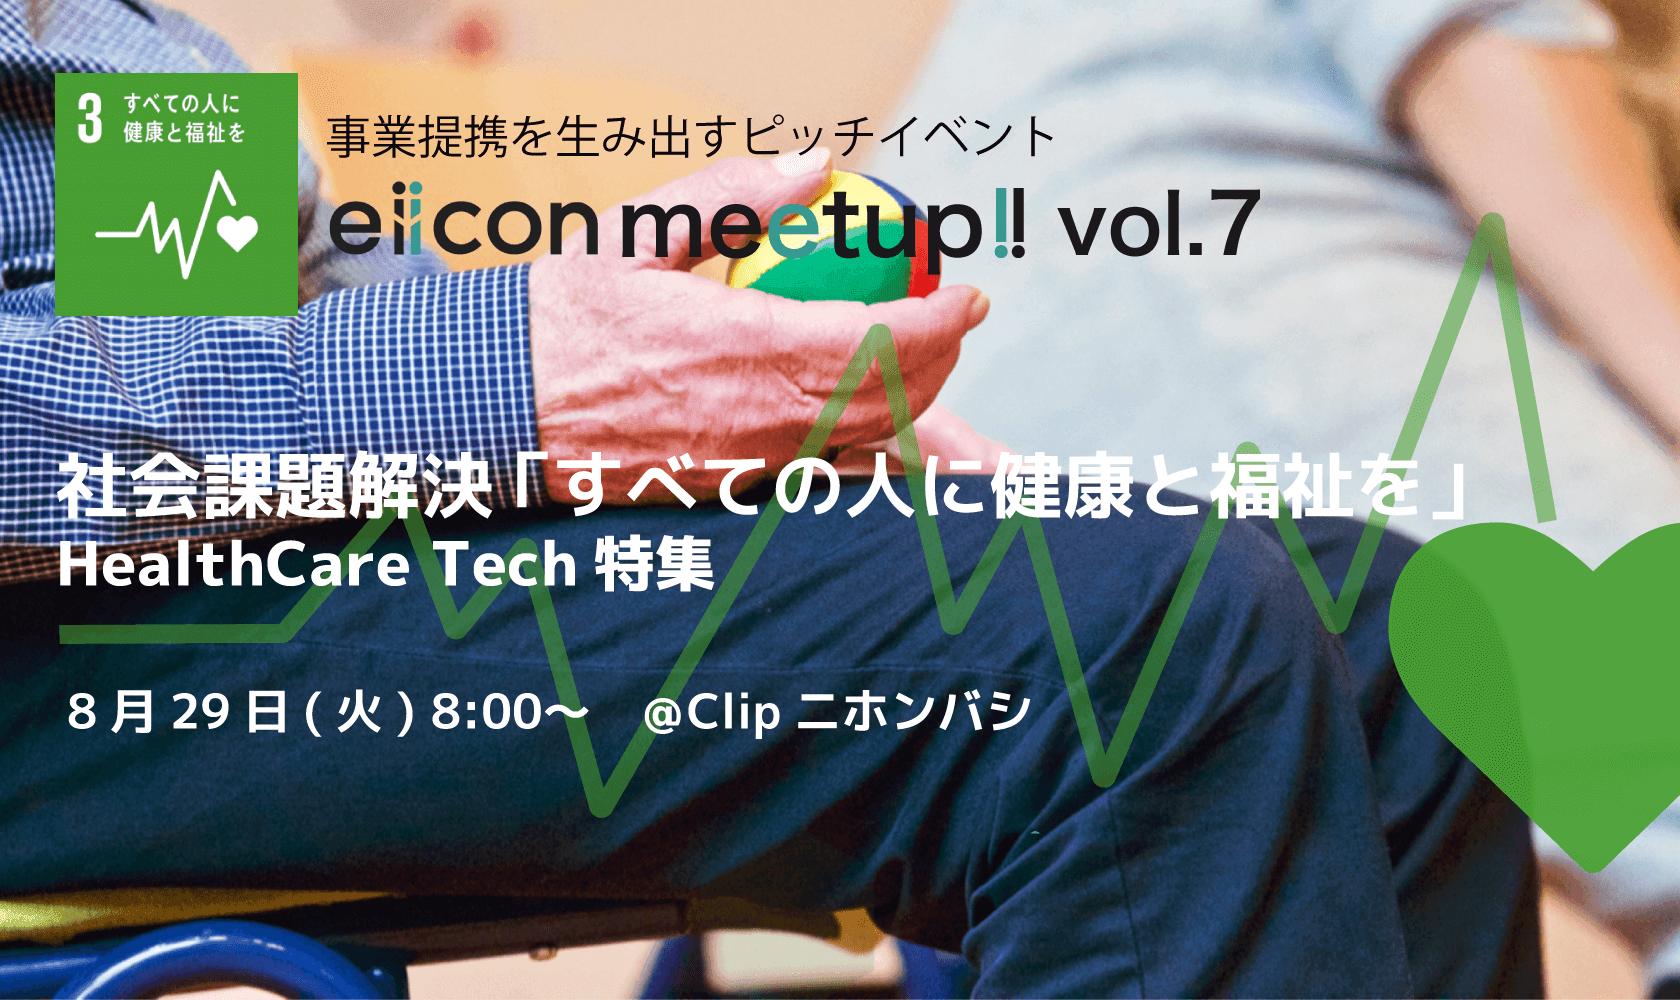 eiicon meet up!!  vol.7 ~社会課題解決 「すべての人に健康と福祉を」HealthCare Tech特集~